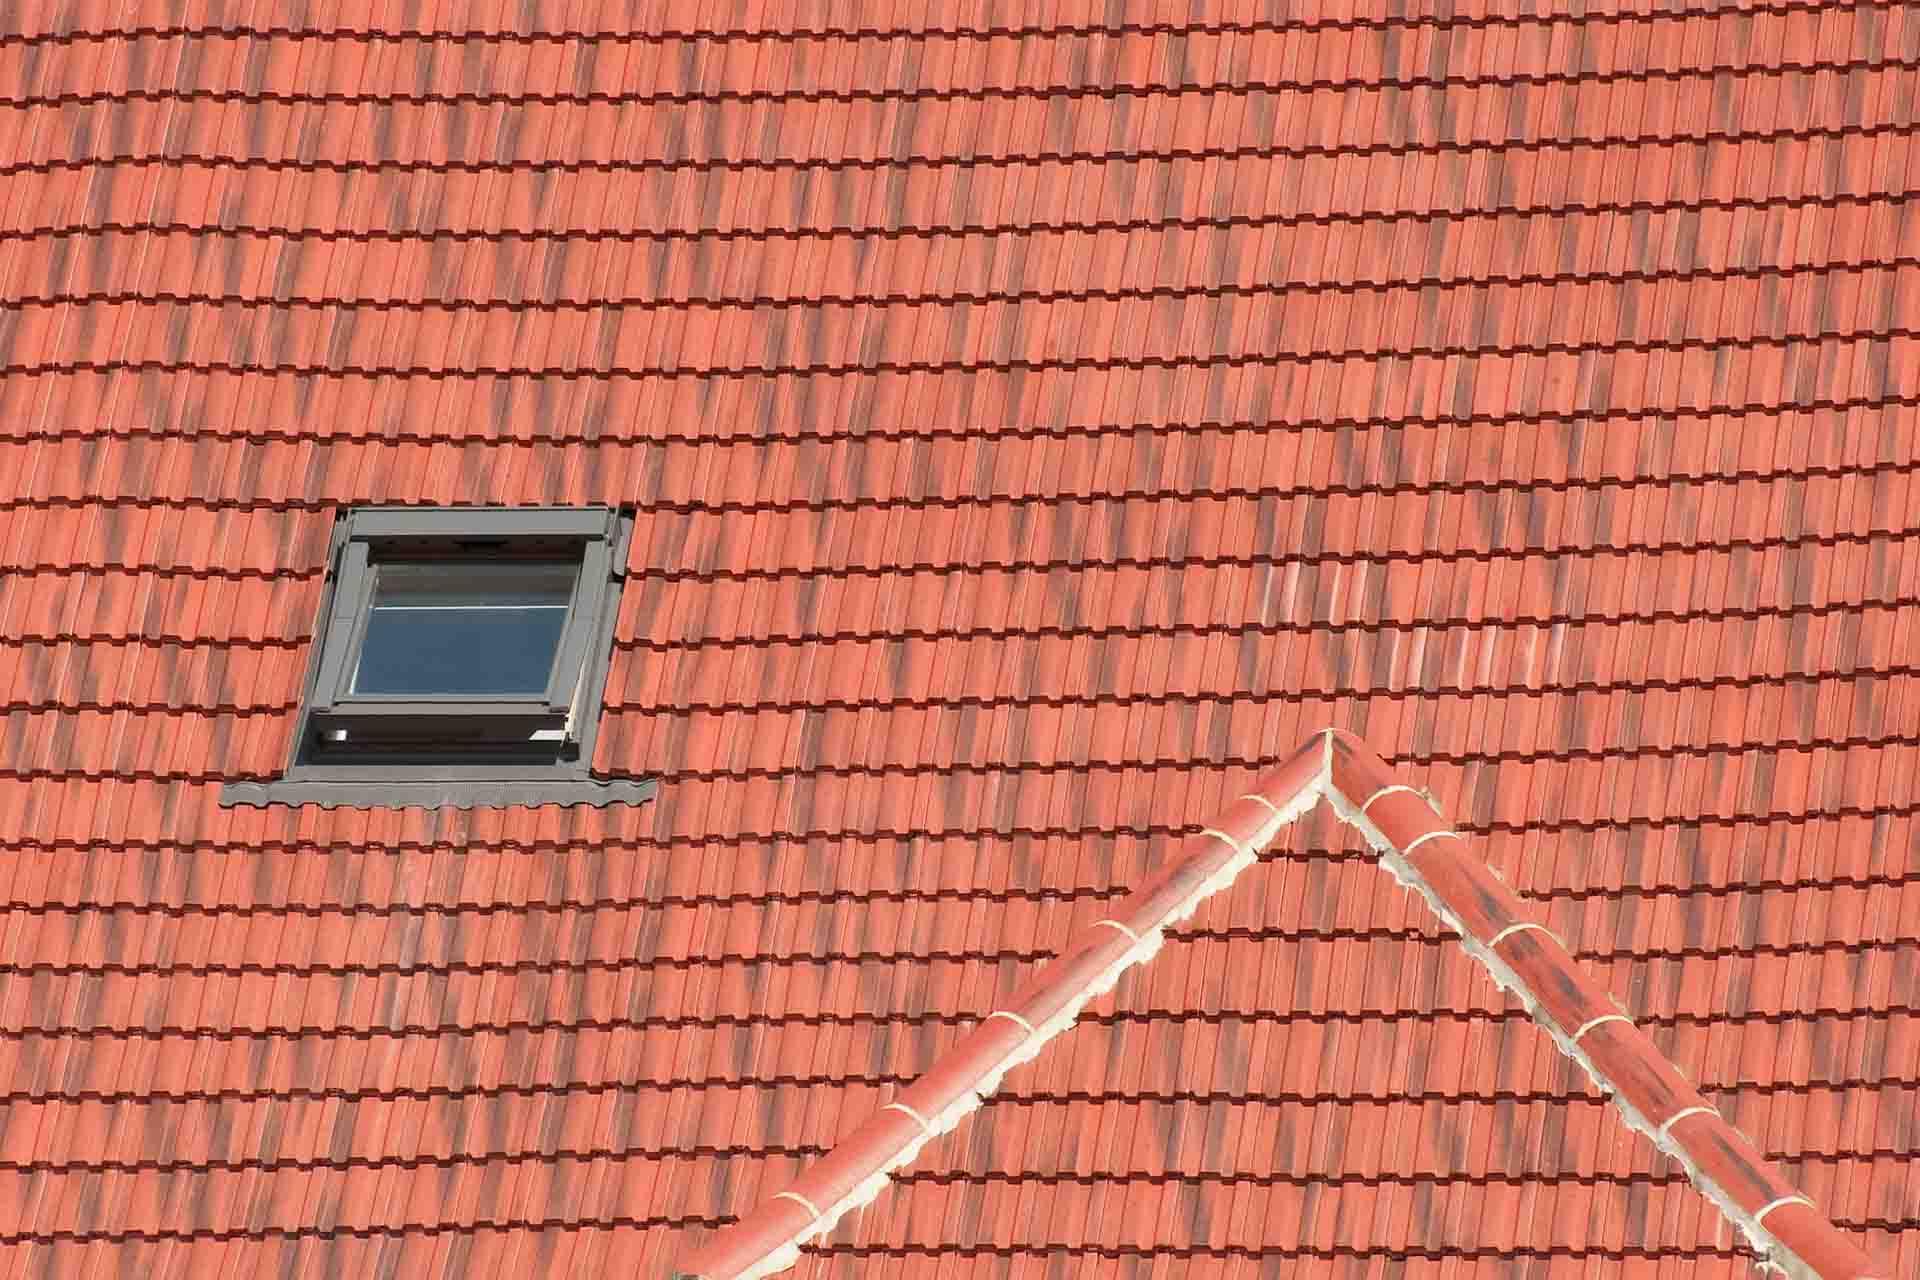 How Do I Choose A New Roof?